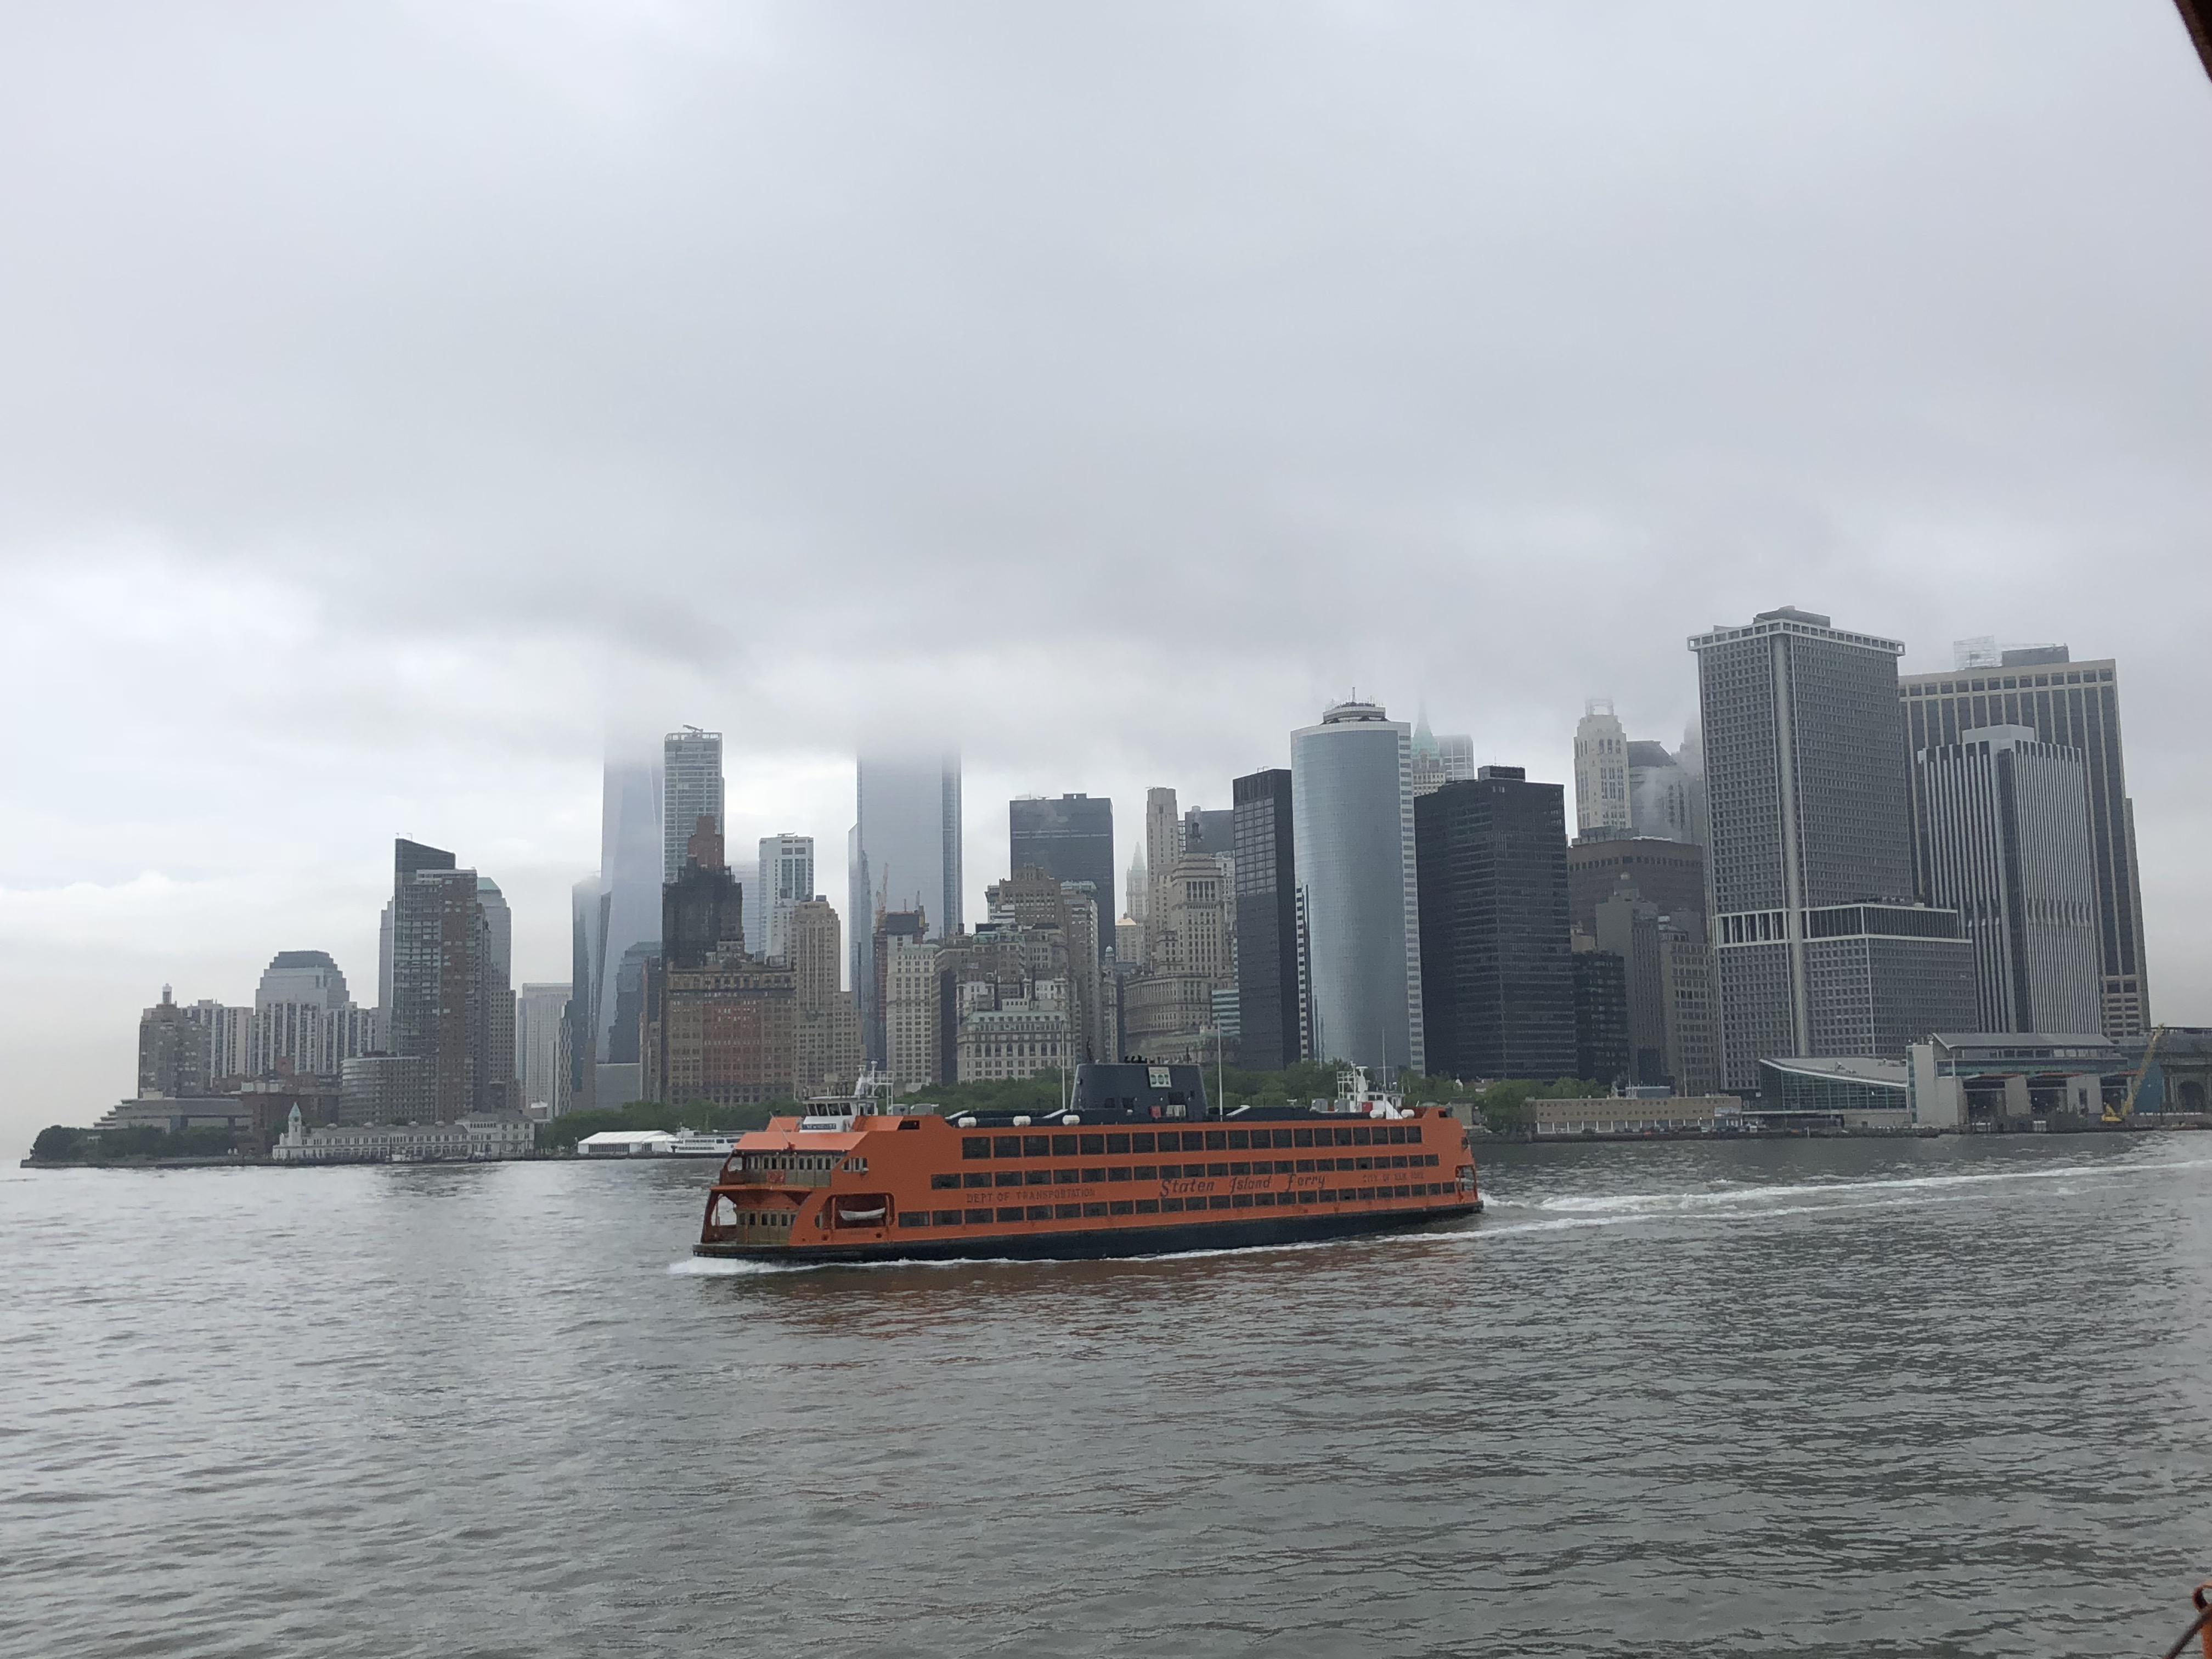 visiter new York avec les enfants